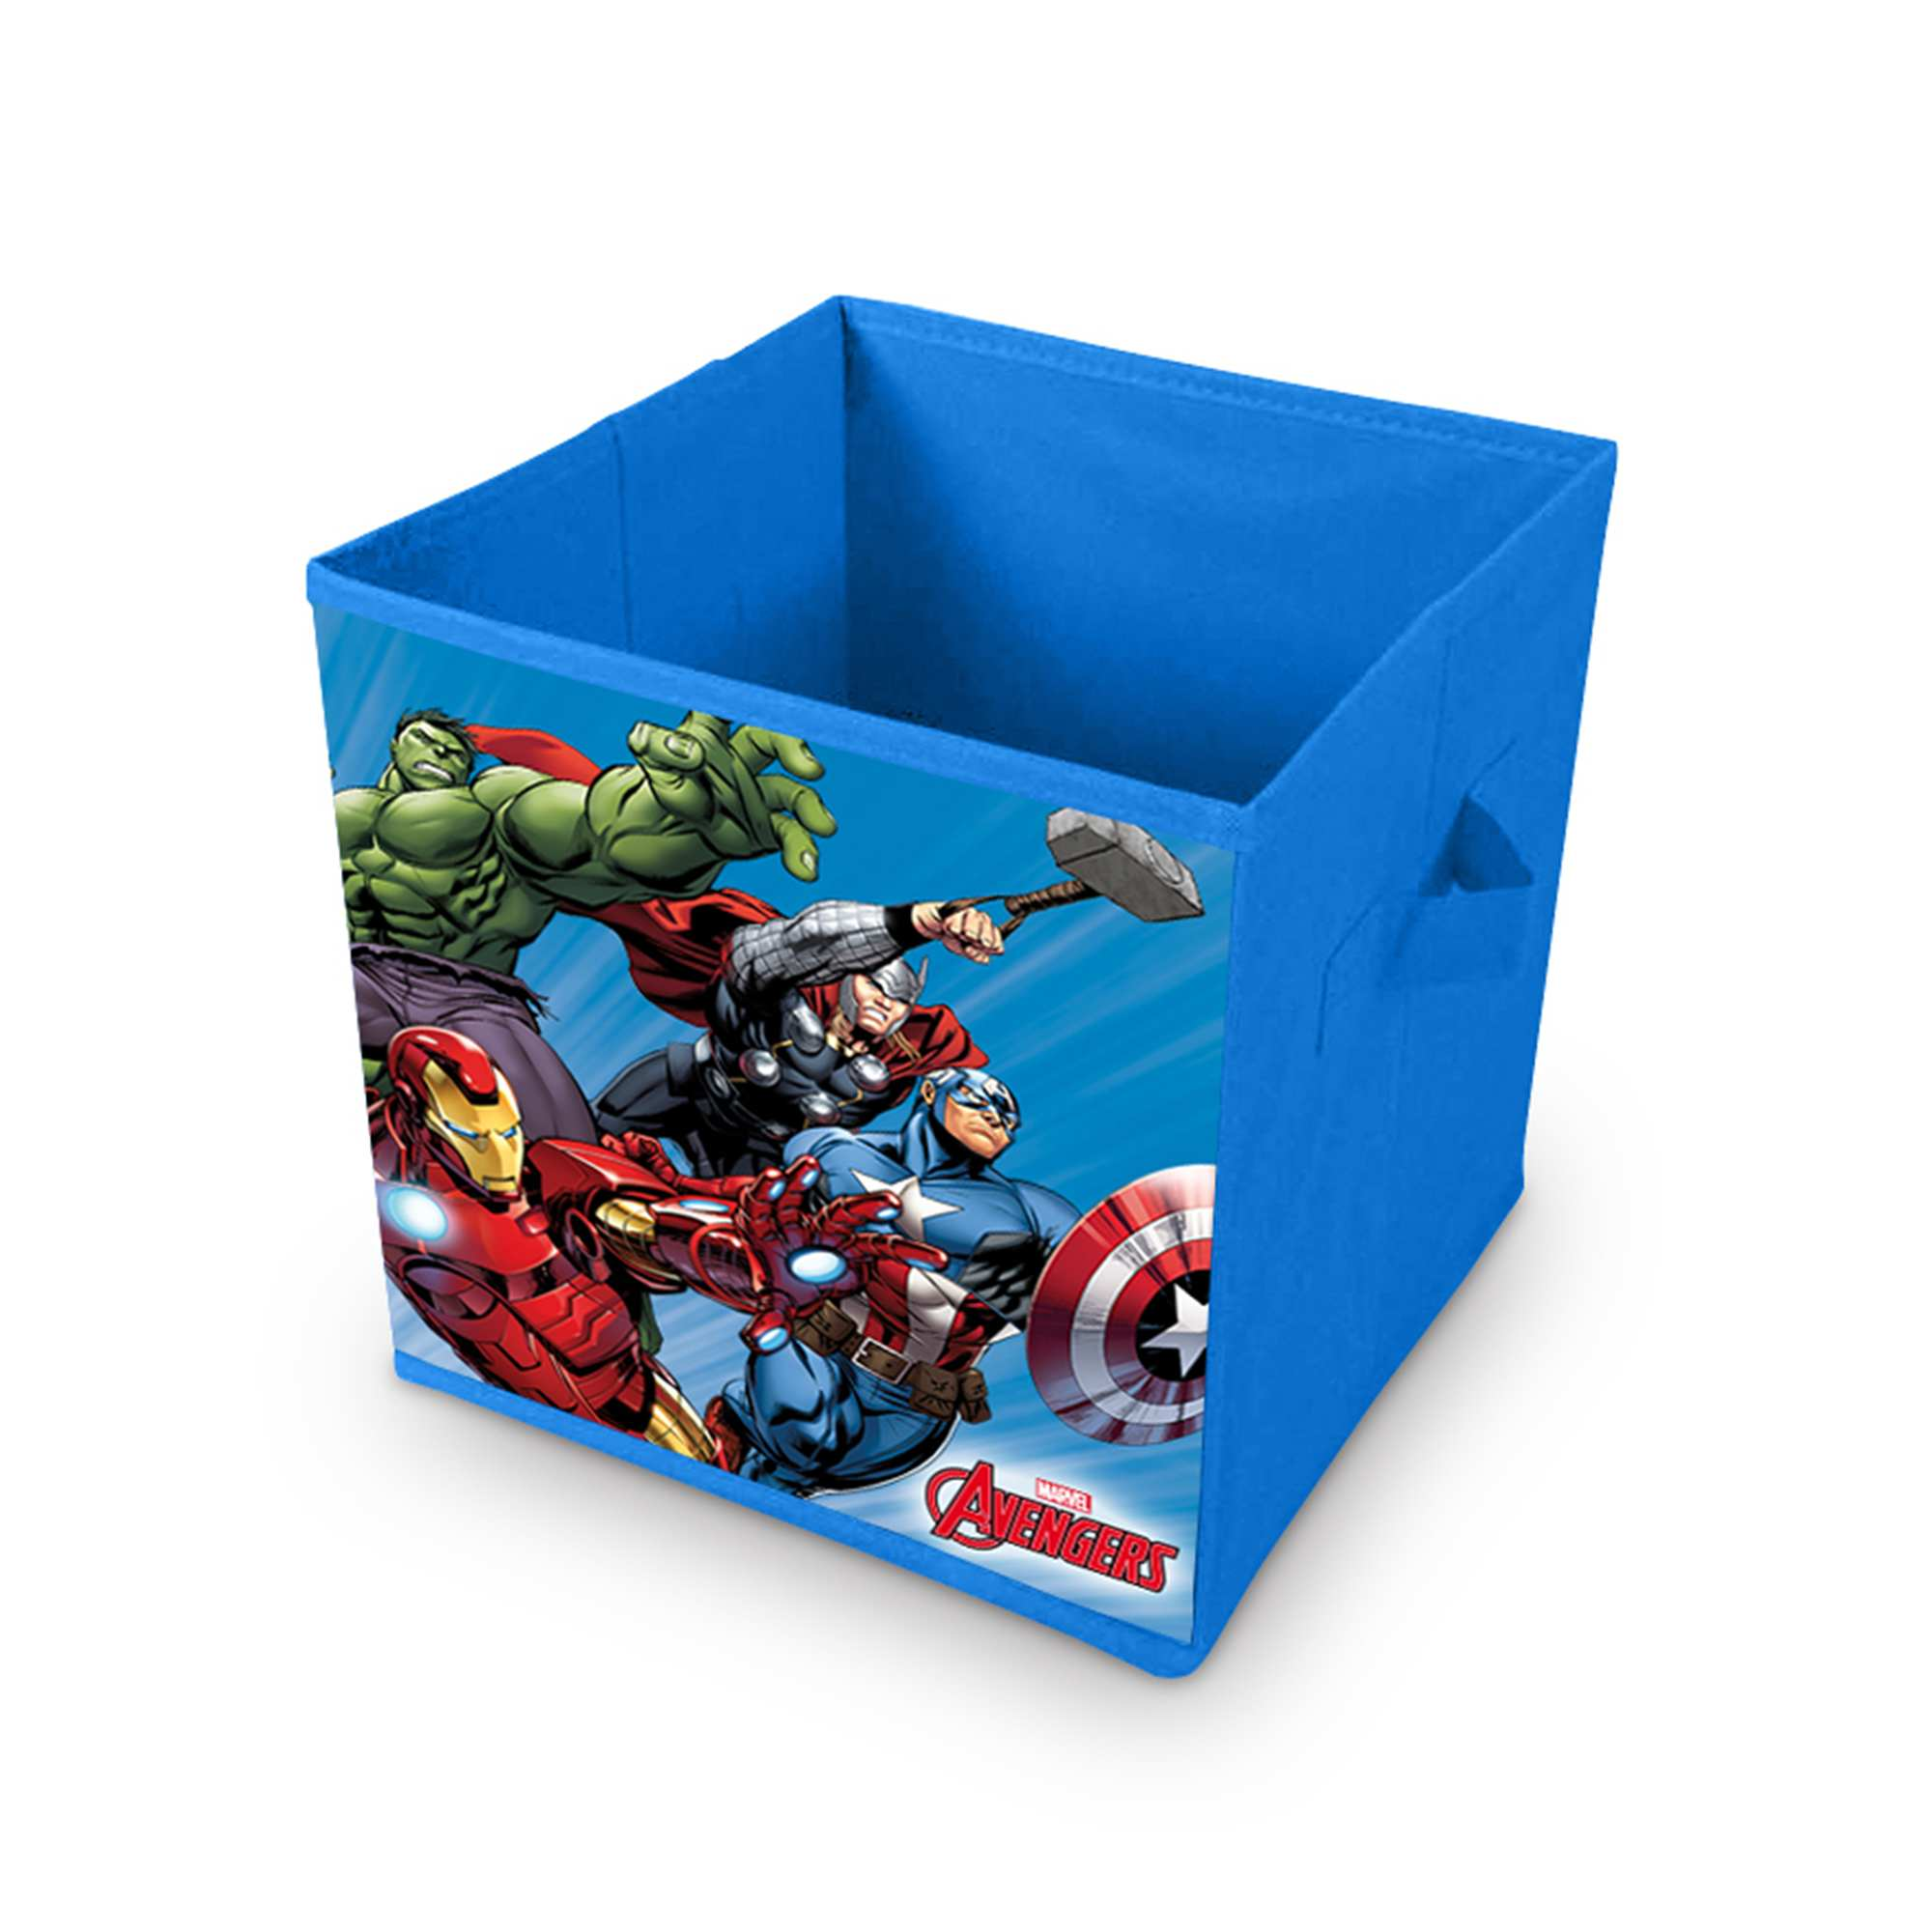 Caja de almacenaje 39 los vengadores 39 hogar azul kiabi - Caja de almacenaje ...